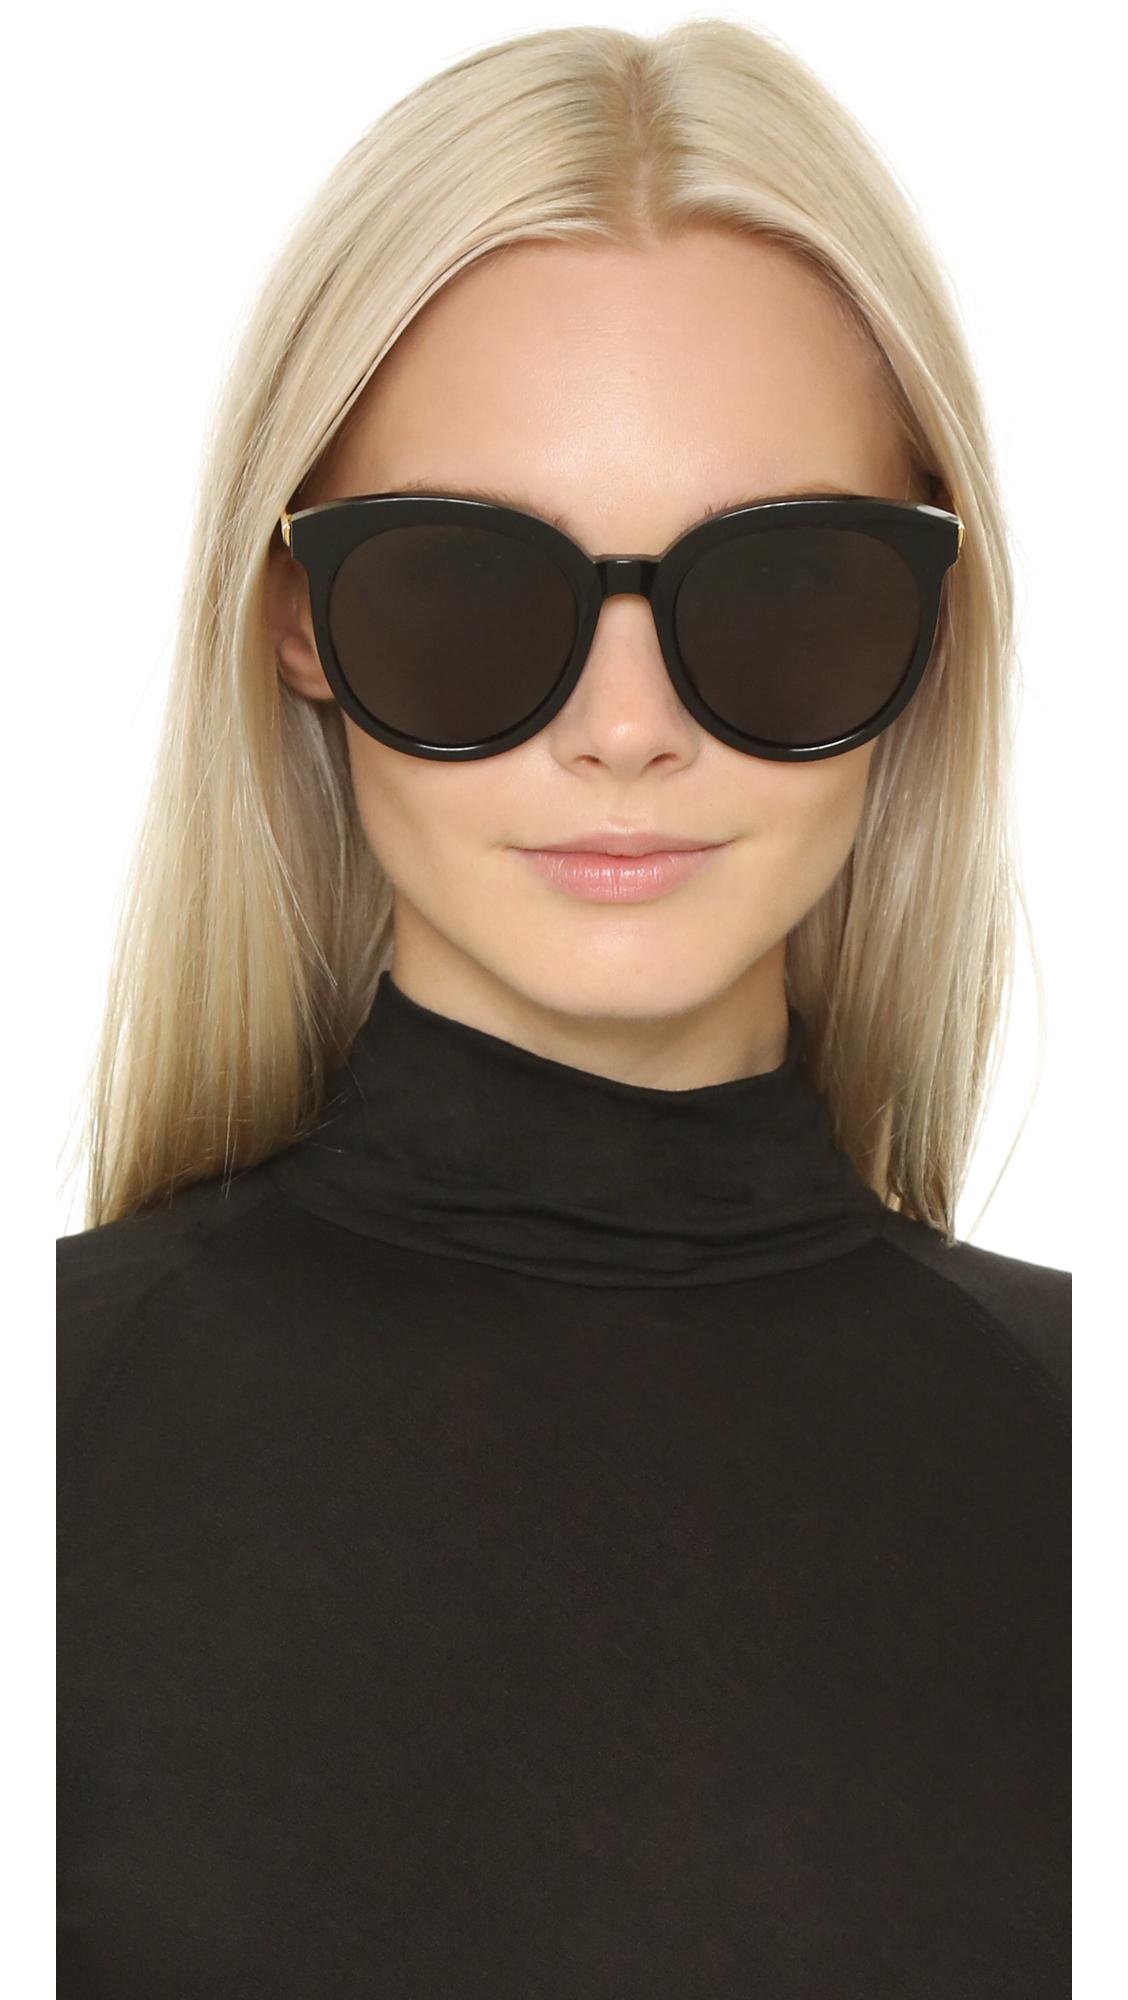 9296a977c1 Lyst - Gentle Monster Lovesome Sunglasses - Black grey in Black